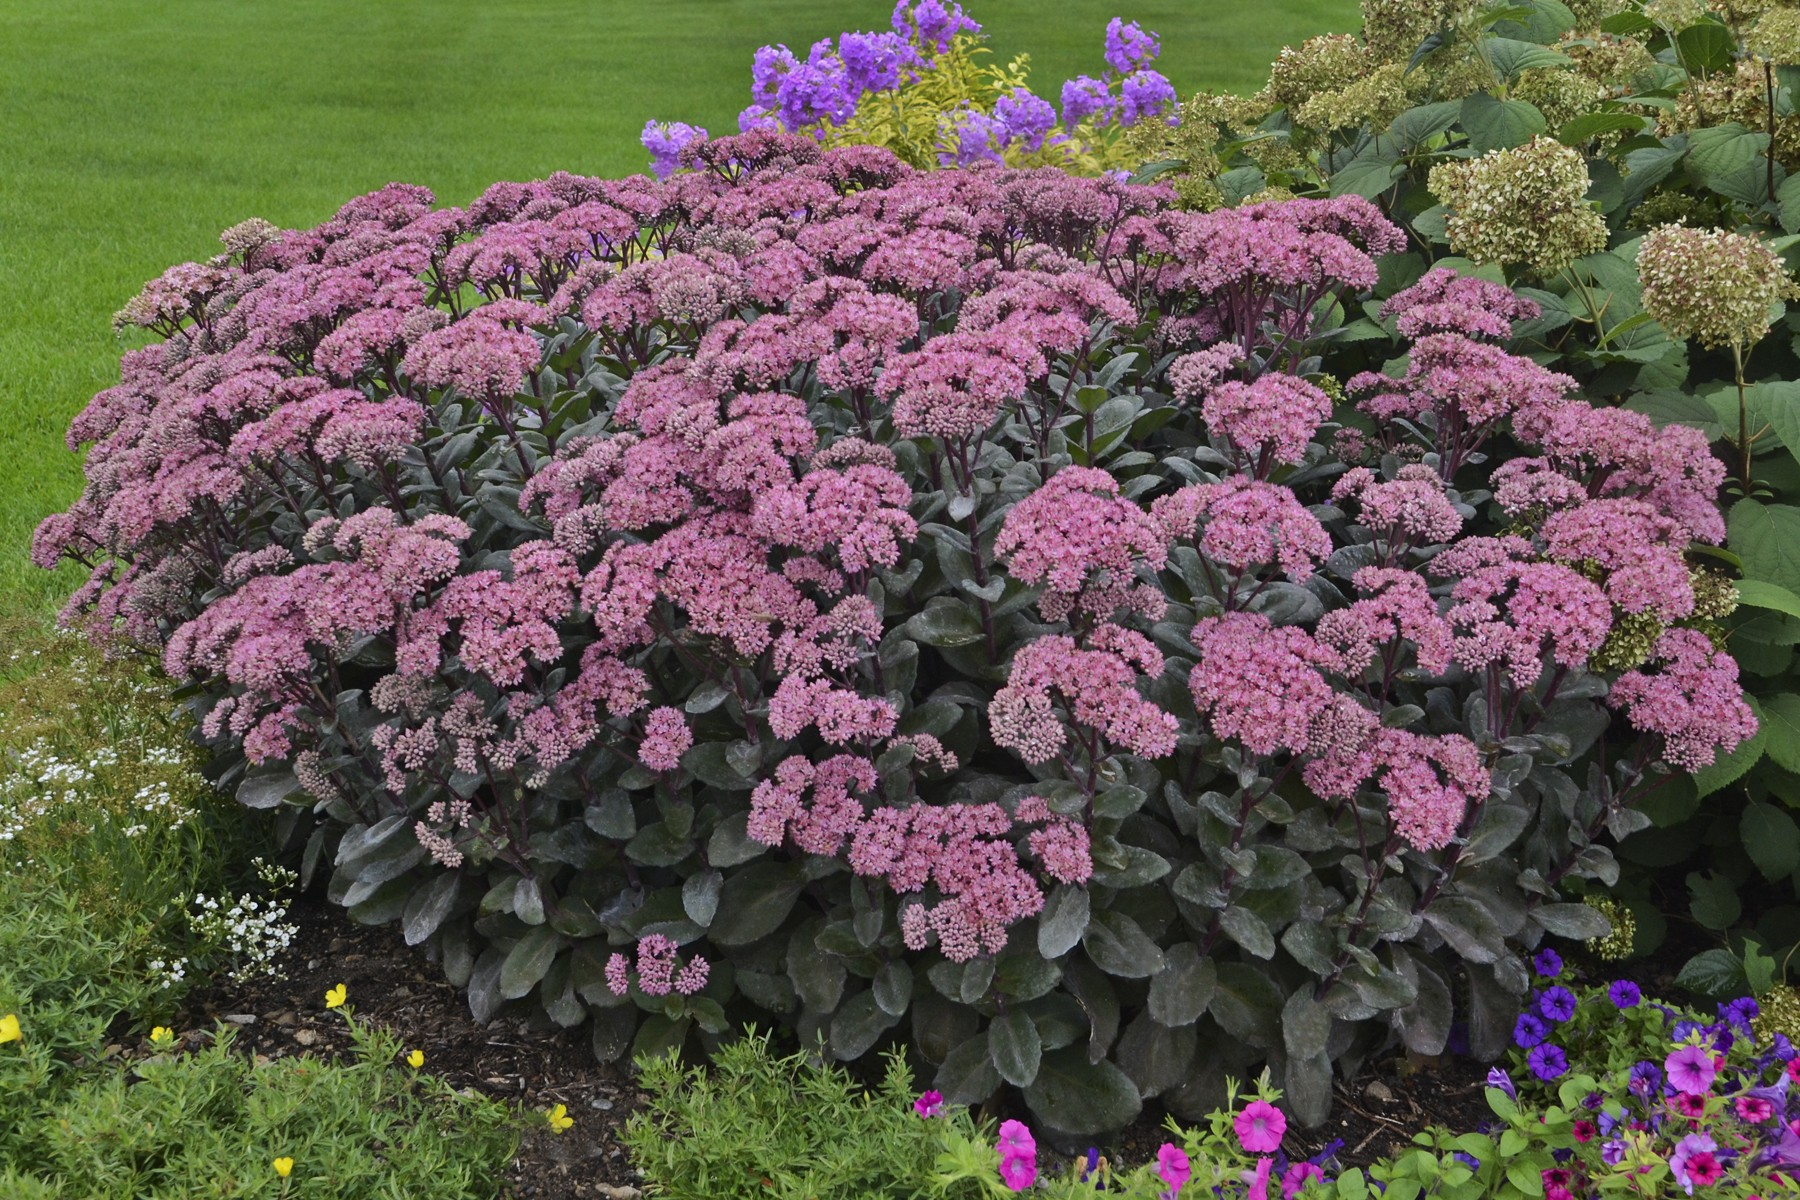 очиток пурпурный или скрипун-трава